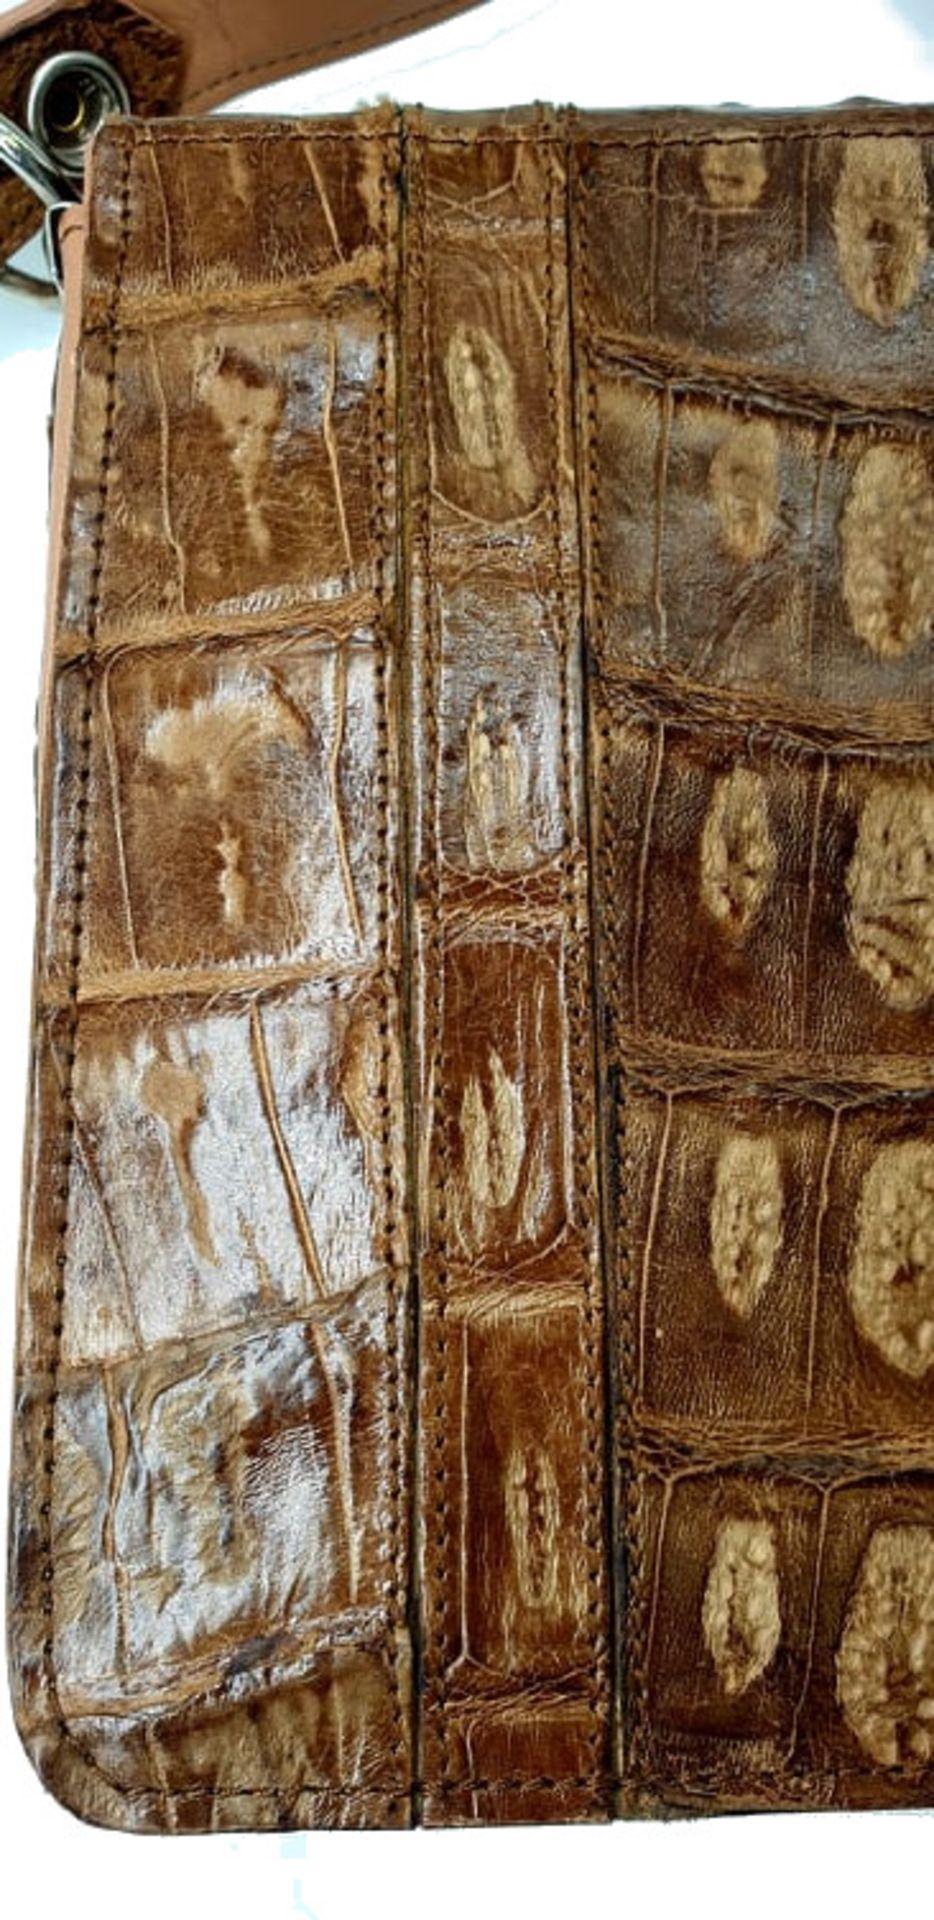 Brown Croco Handbag - Bild 3 aus 8